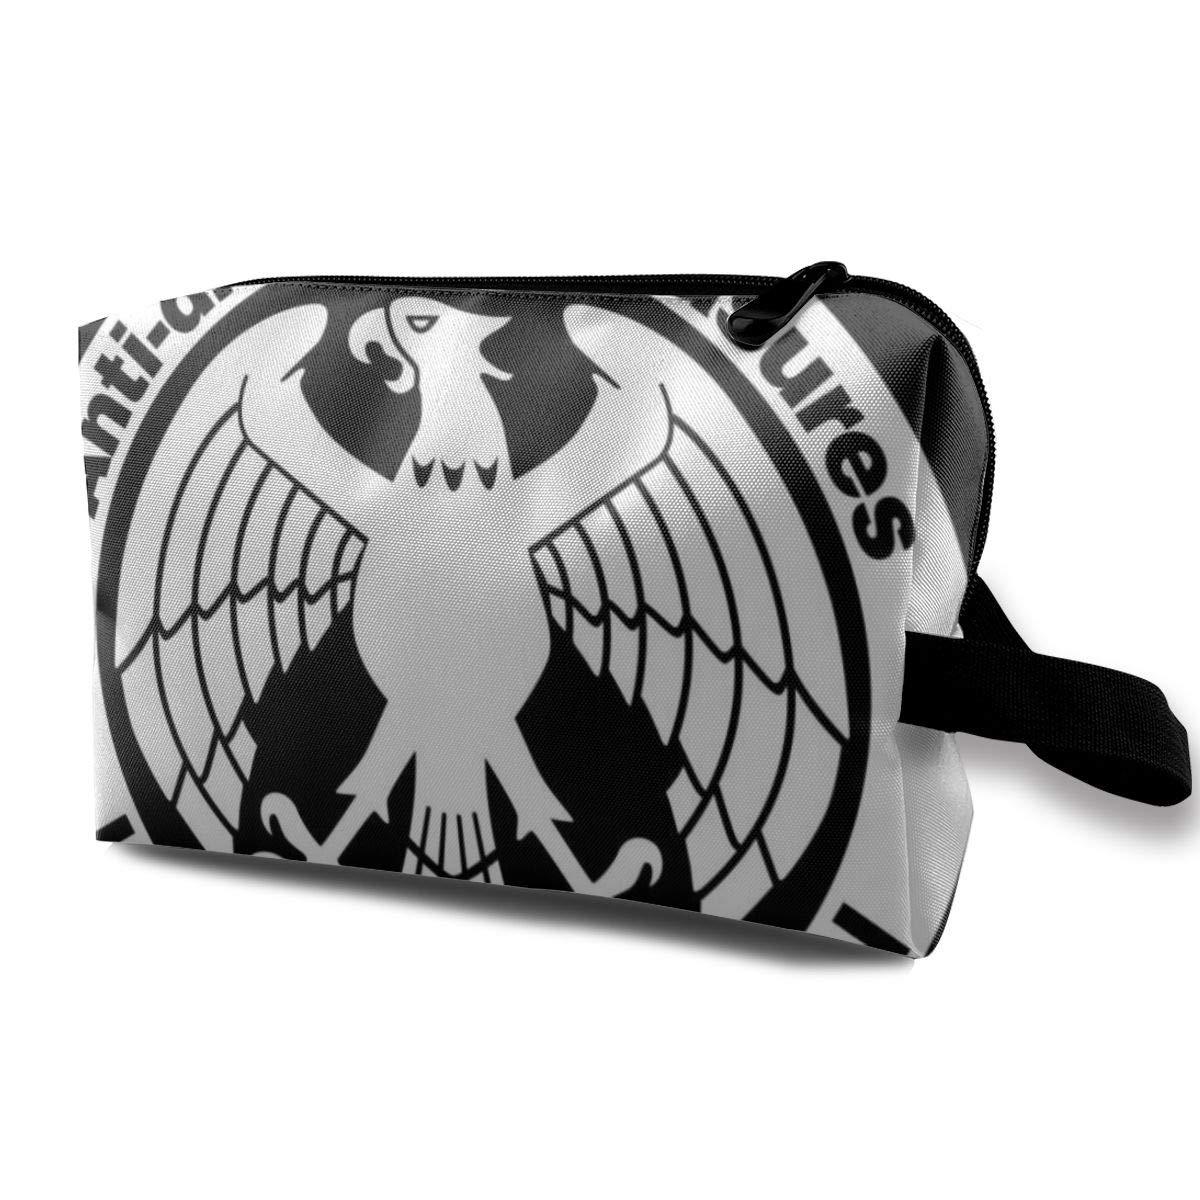 Makeup Bag Cosmetic Pouch Anti Disaster Measure Hero Association One Punch Man Multi-Functional Bag Travel Kit Storage Bag